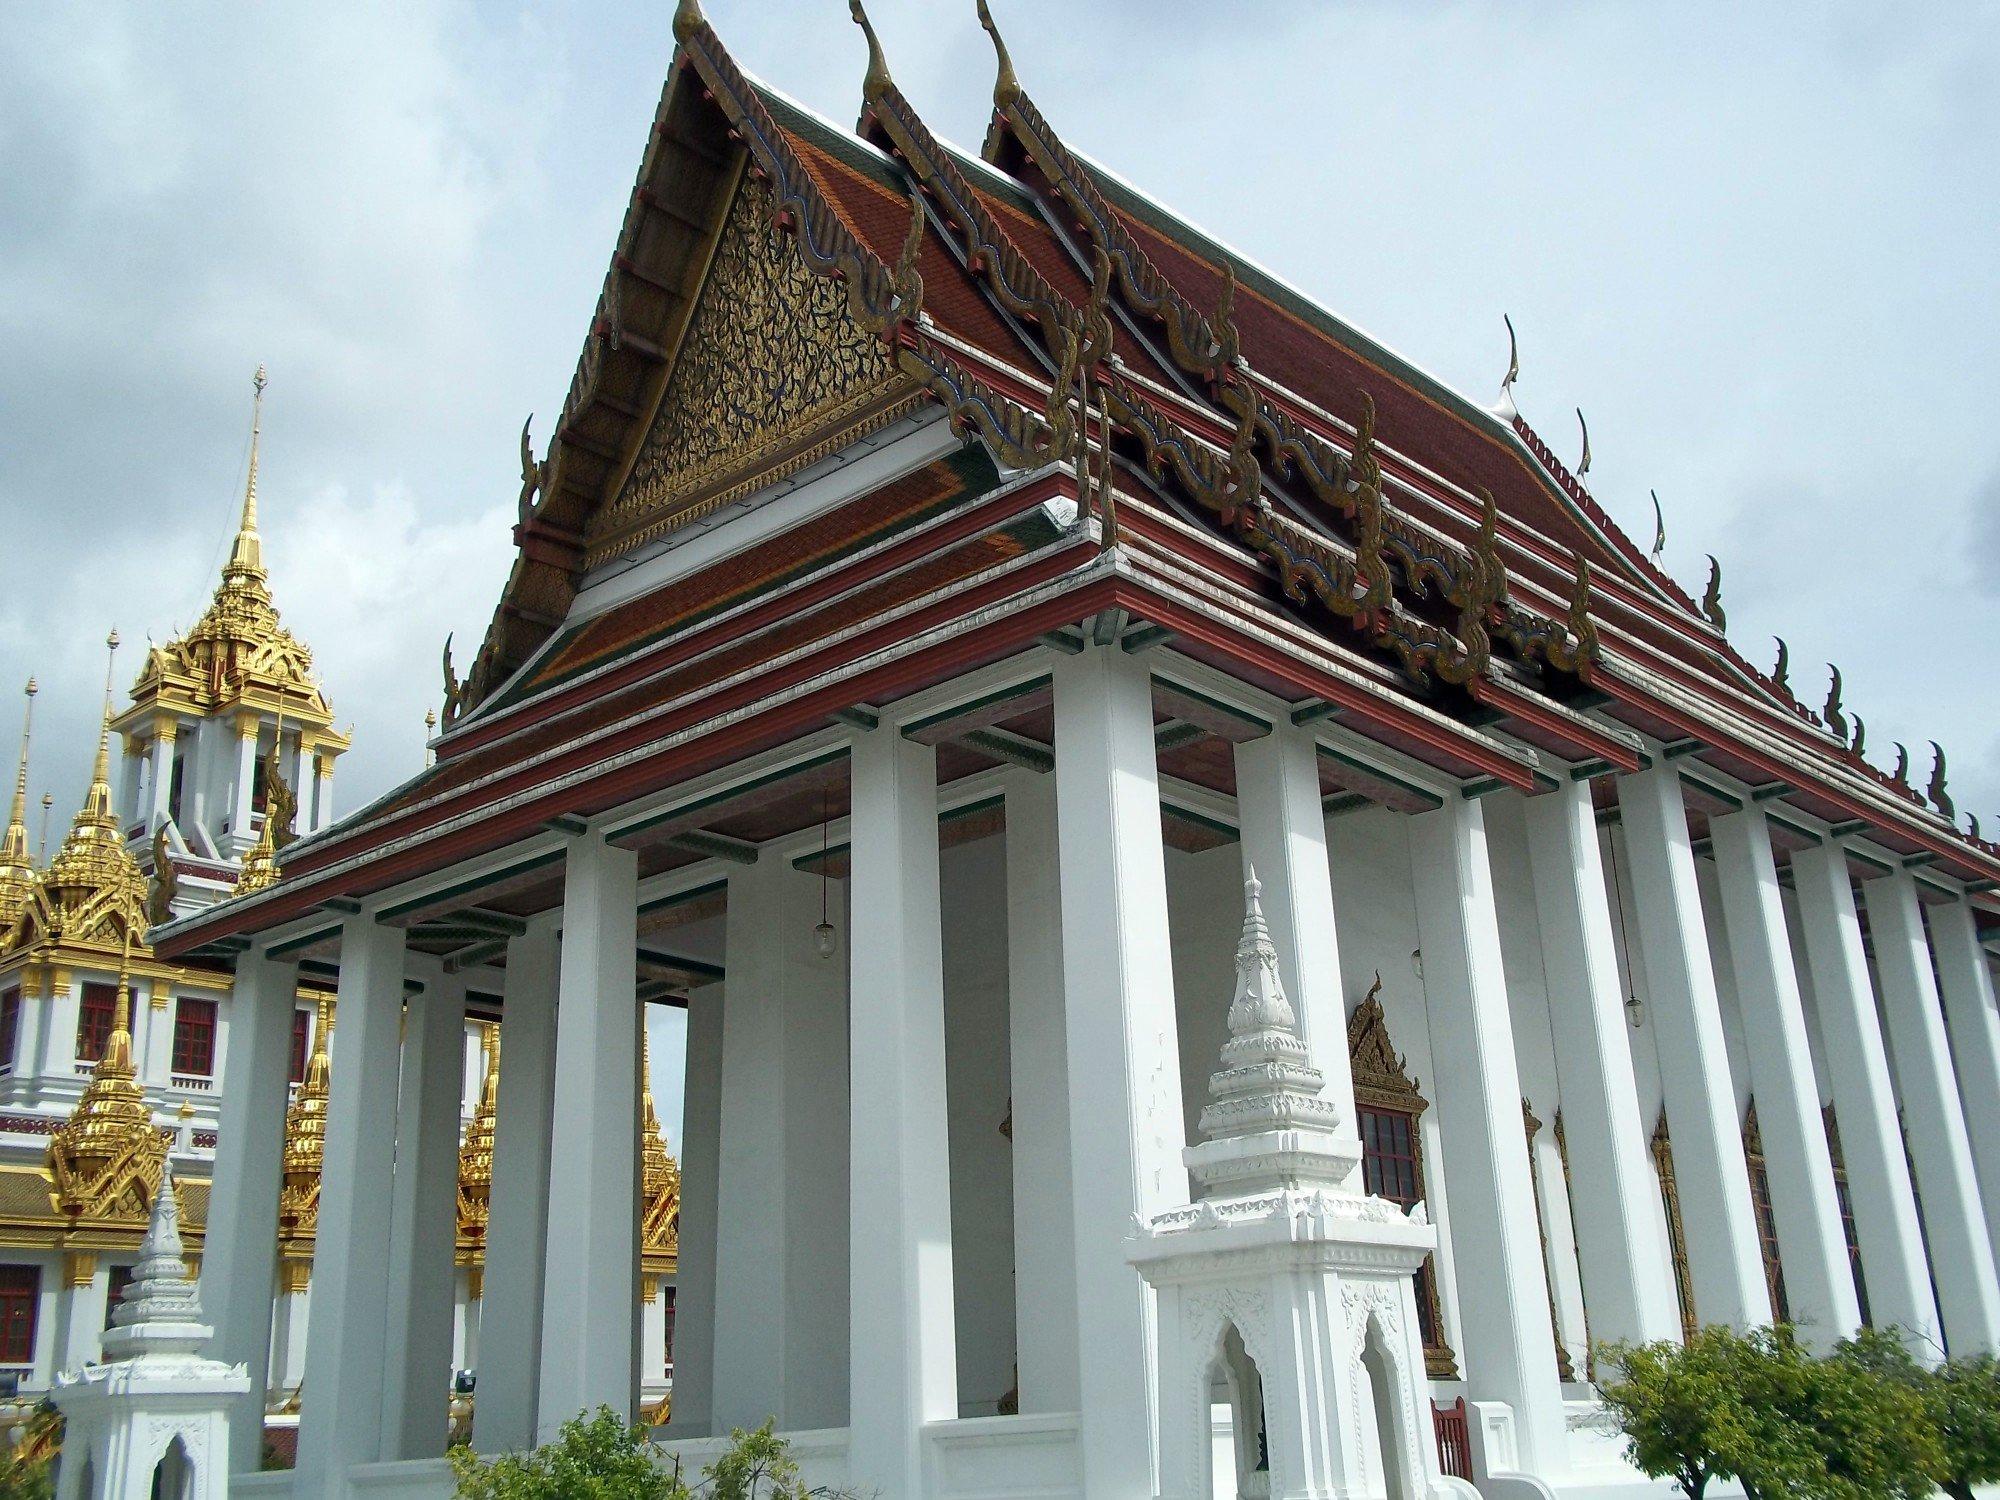 Ordination Hall at Wat Ratchanatda